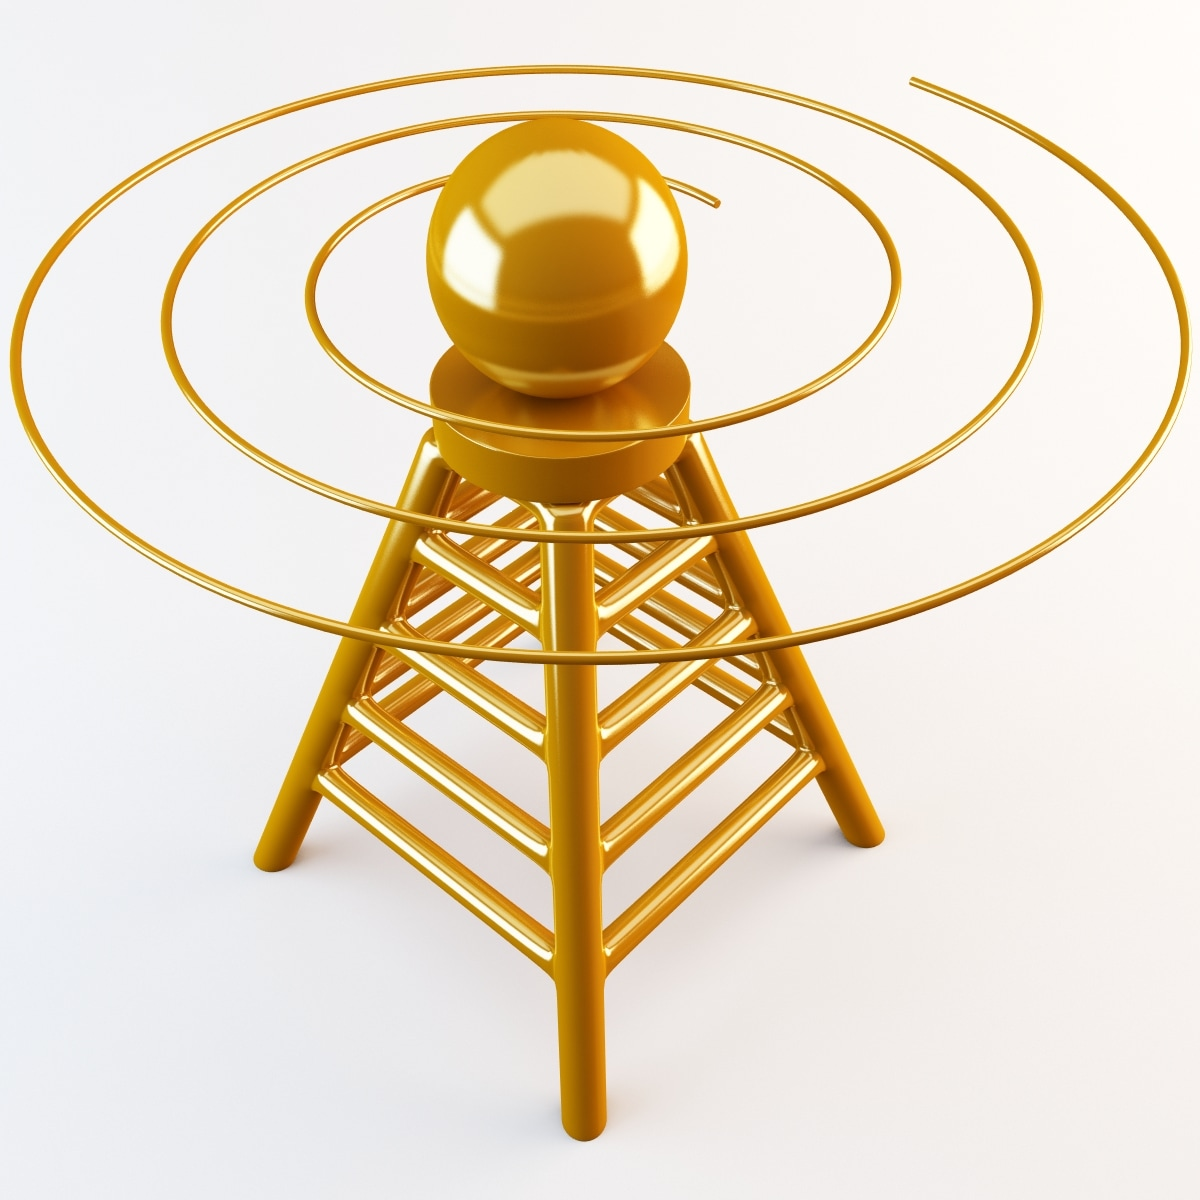 max telecommunication tower icon